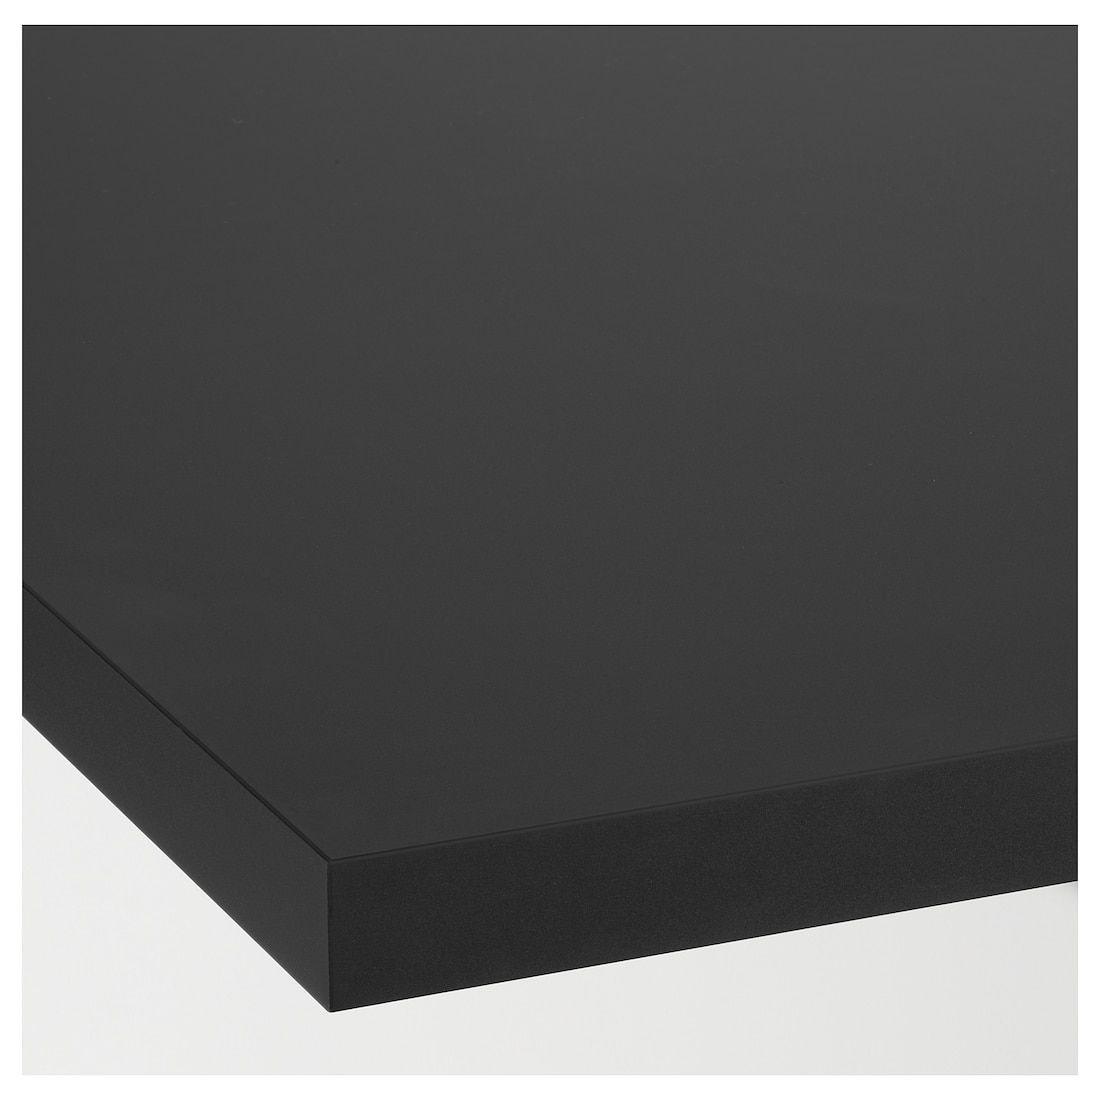 Ekbacken Plan De Travail Mat Anthracite Stratifie 246x2 8 Cm Produit Nettoyage Ikea Et Stratifie